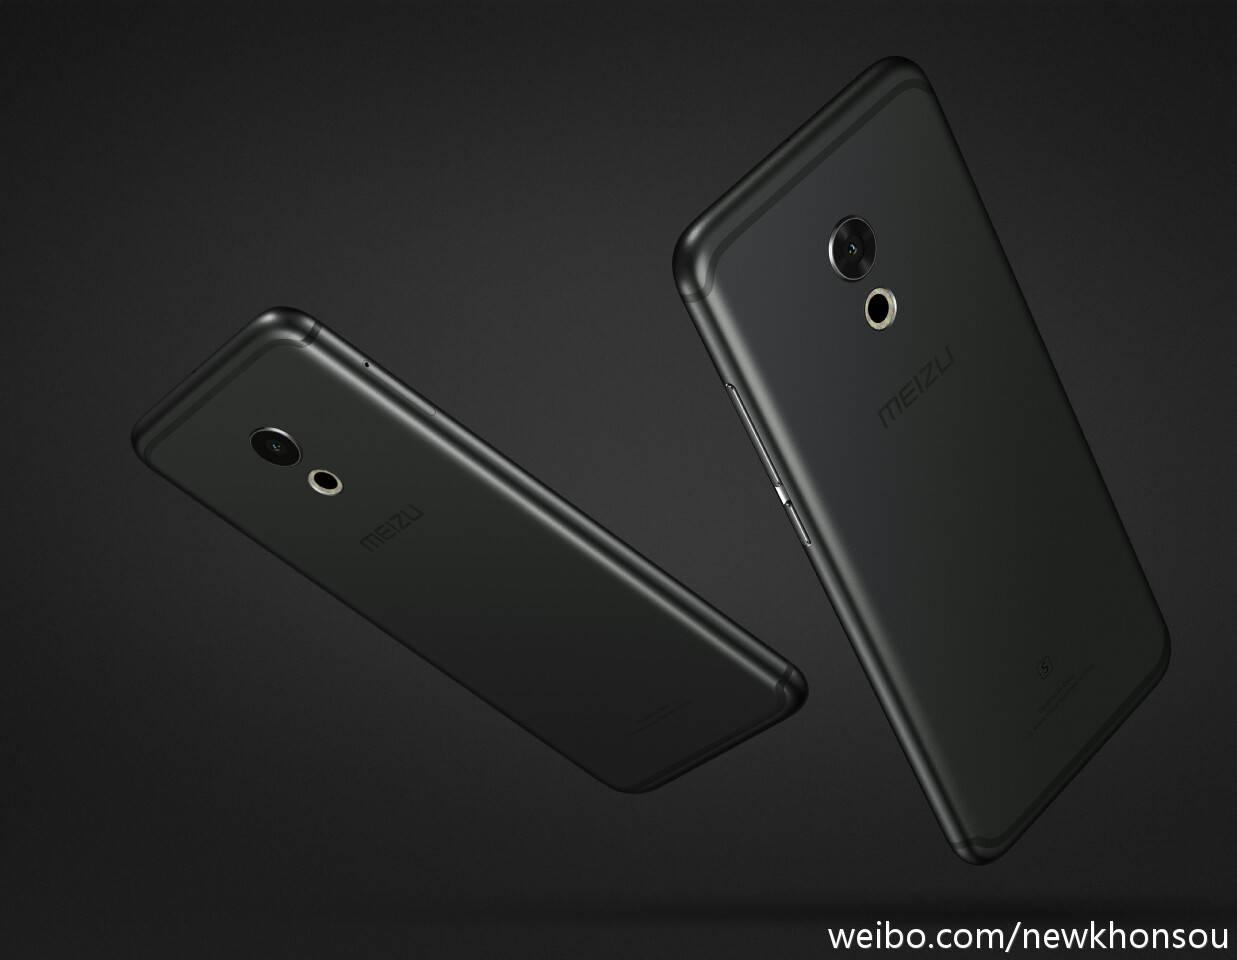 Meizuの副総裁が、Meizu Pro 6sの画像をフライングで公開。Meizu Pro 6のSブランドが存在。